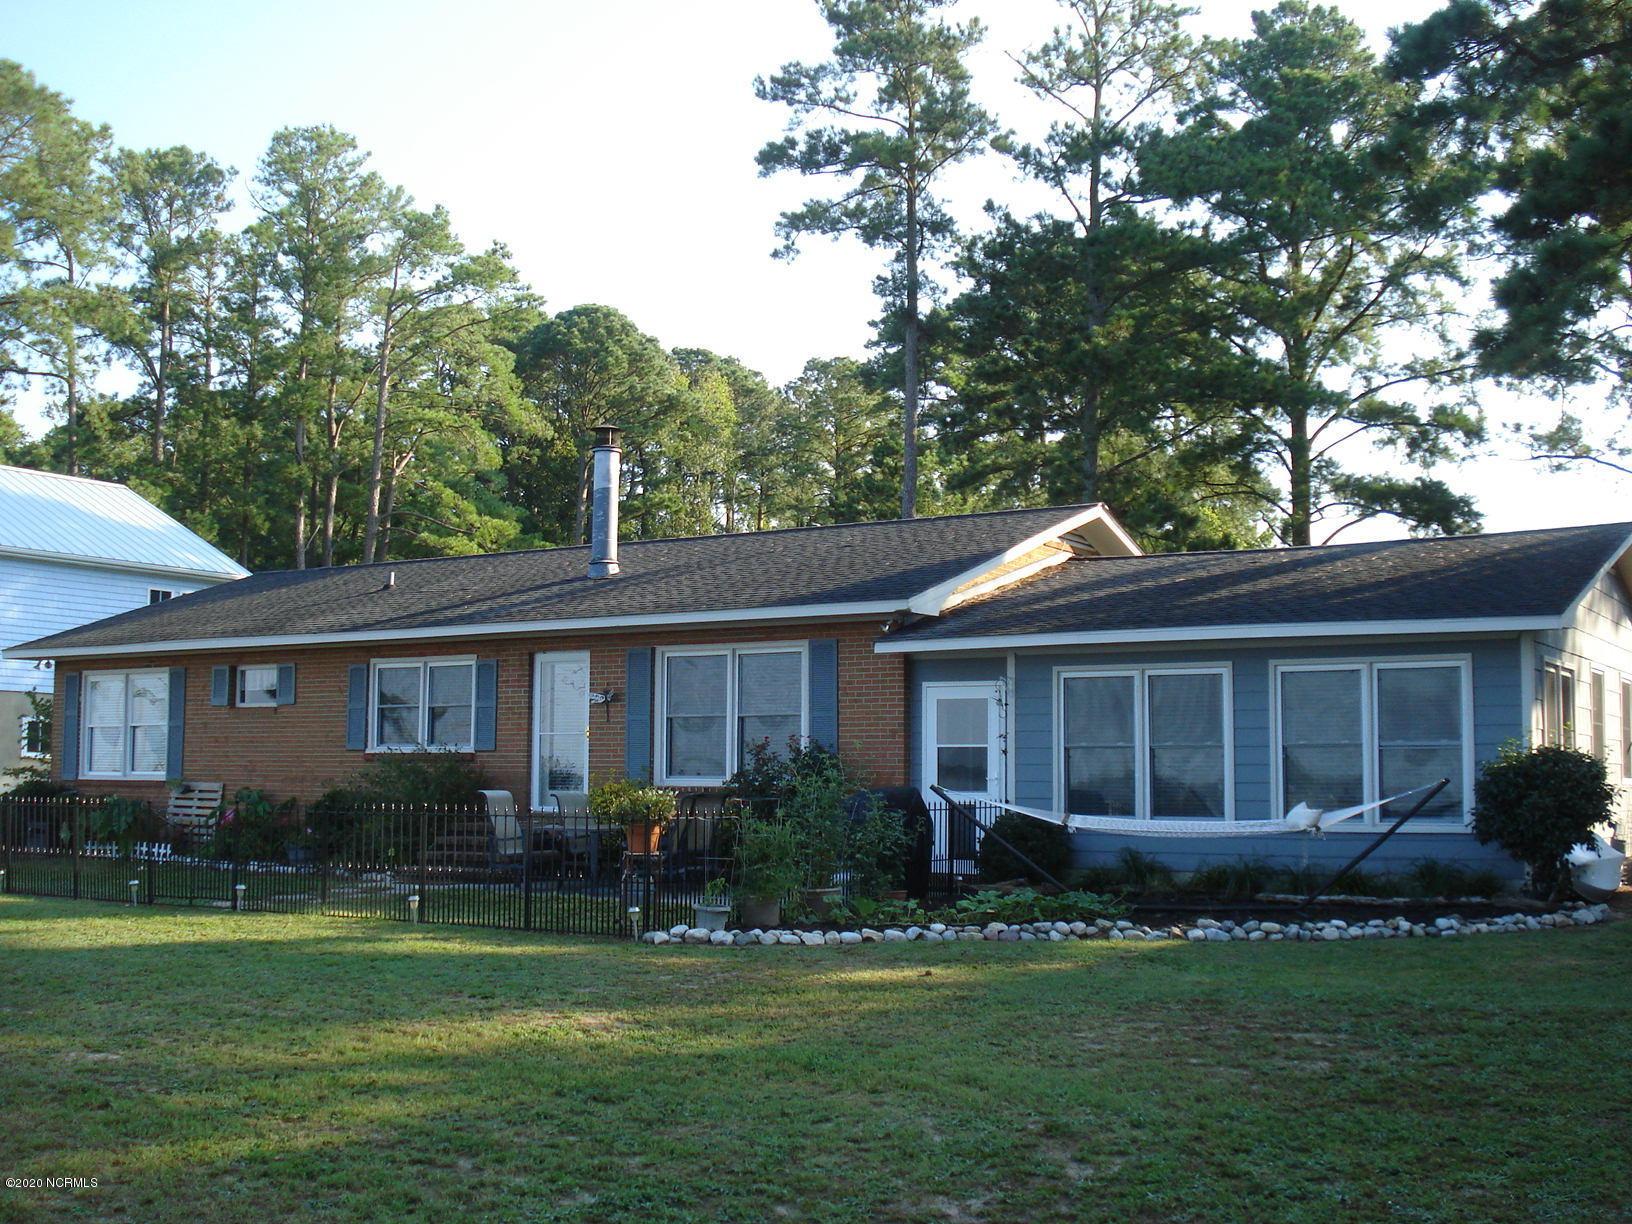 304 Sunnyside Drive, Washington, North Carolina 27889, 3 Bedrooms Bedrooms, 6 Rooms Rooms,2 BathroomsBathrooms,Single family residence,For sale,Sunnyside,100223586